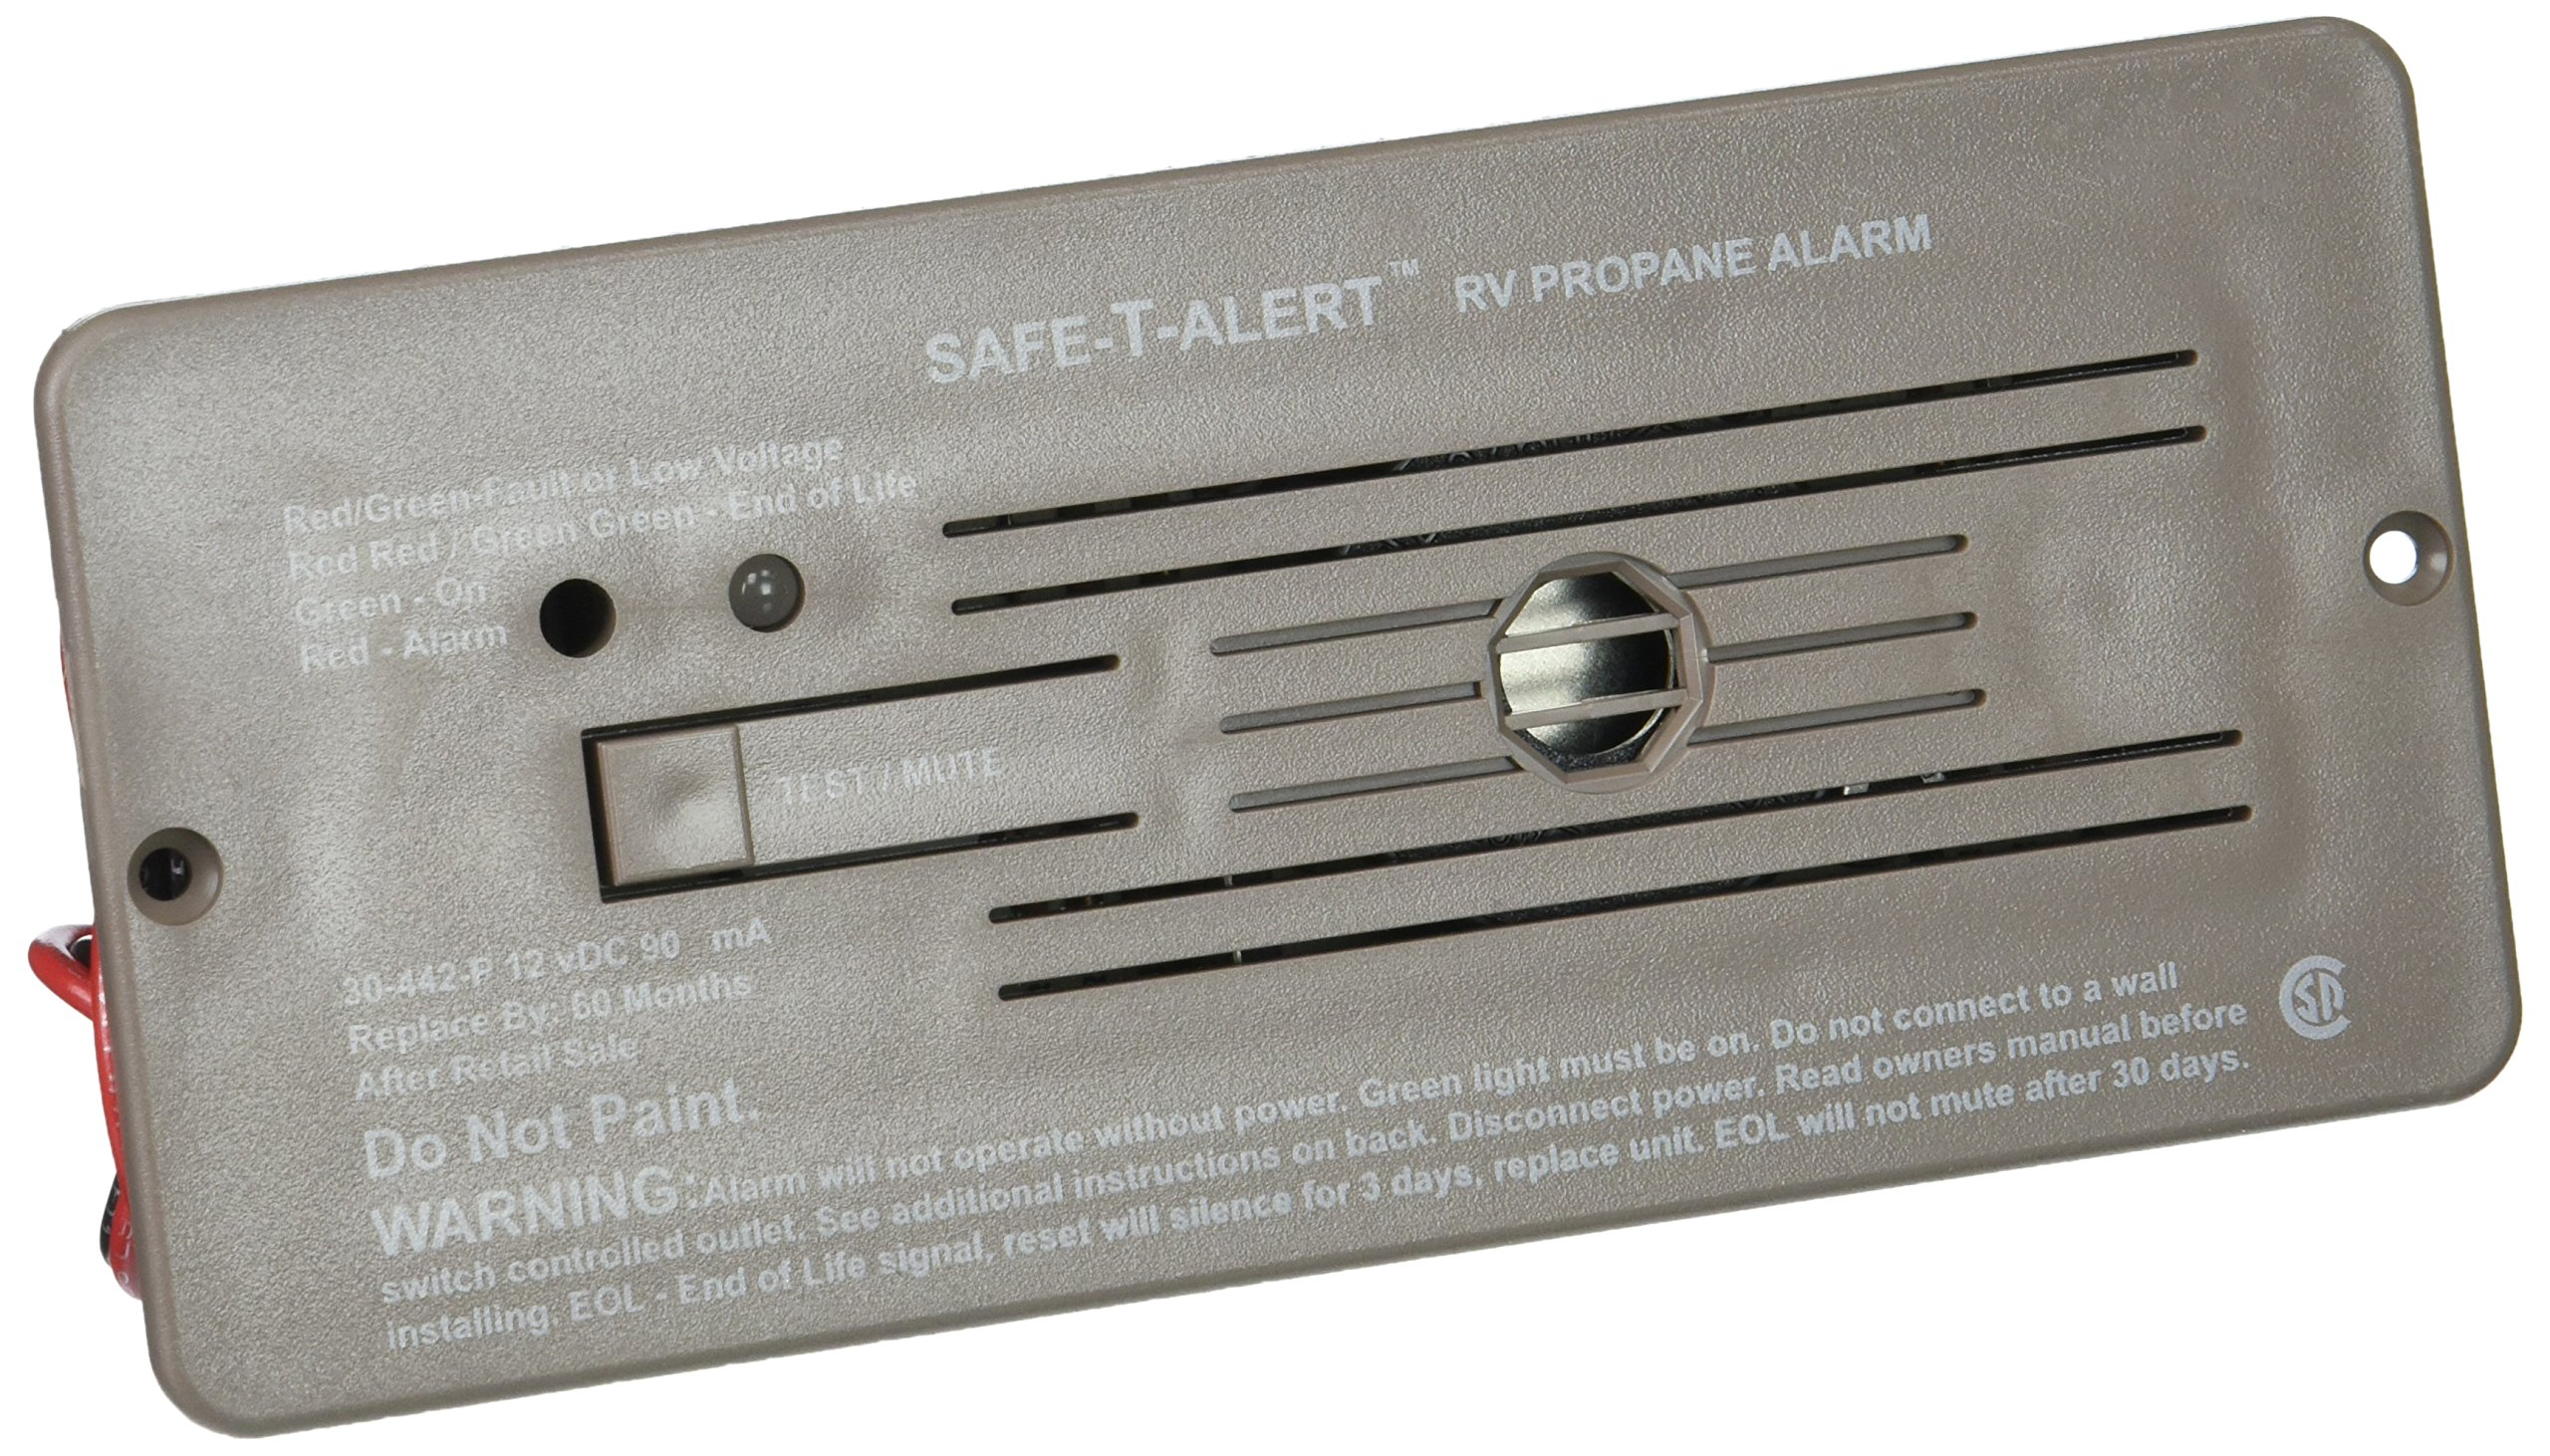 MTI Industries 30-442-P-BR Safe T Alert 30 Series Propane/LP Gas Alarm - Flush Mount, Brown by MTI